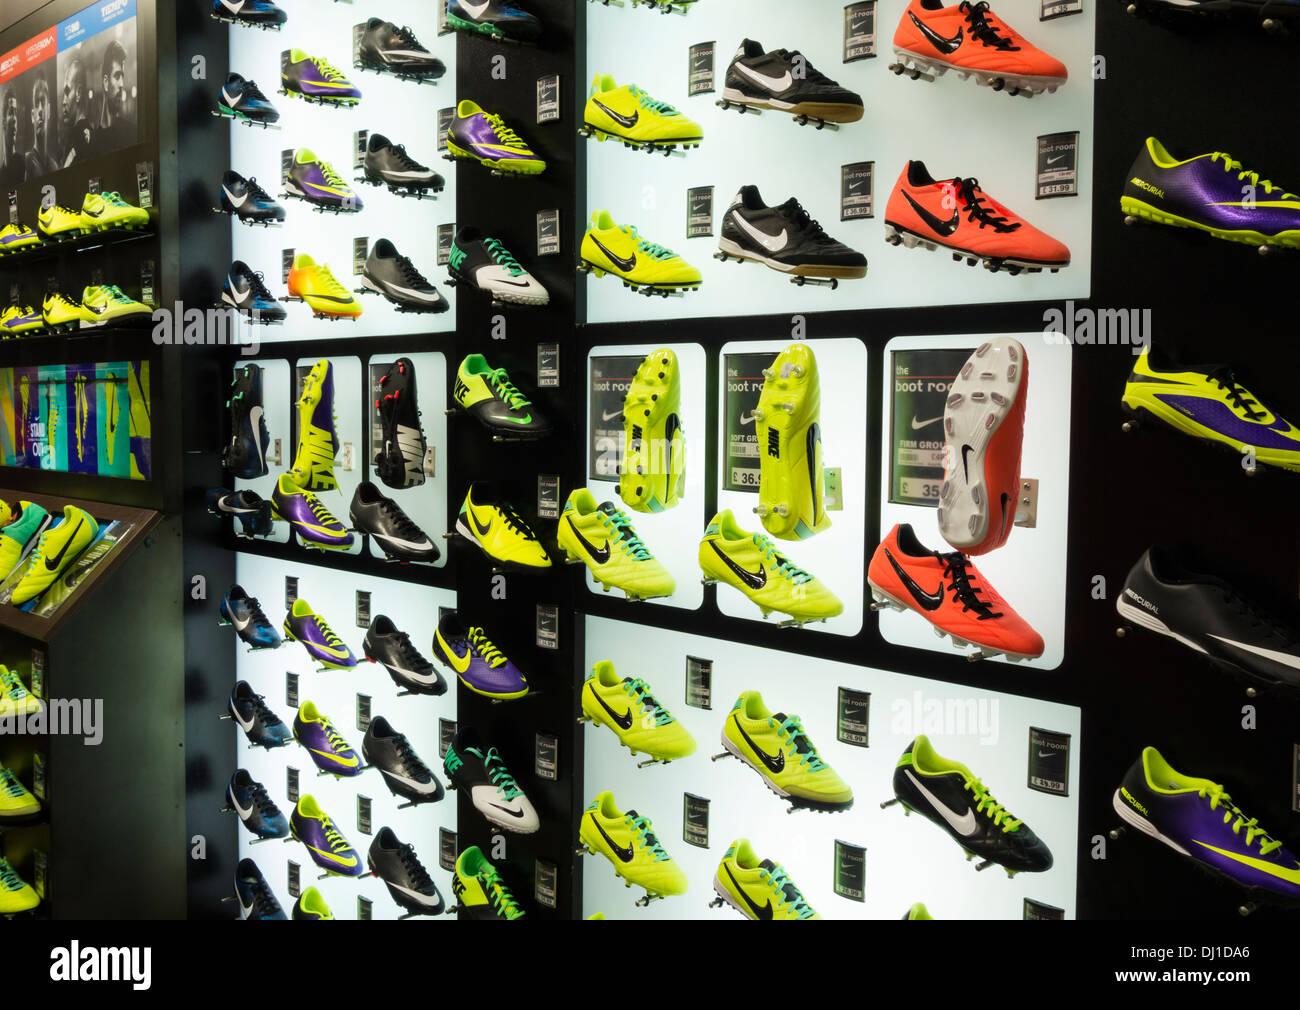 MagasinL'angleterre Football Sports Direct De Nike Chaussures En Ygbyf6v7